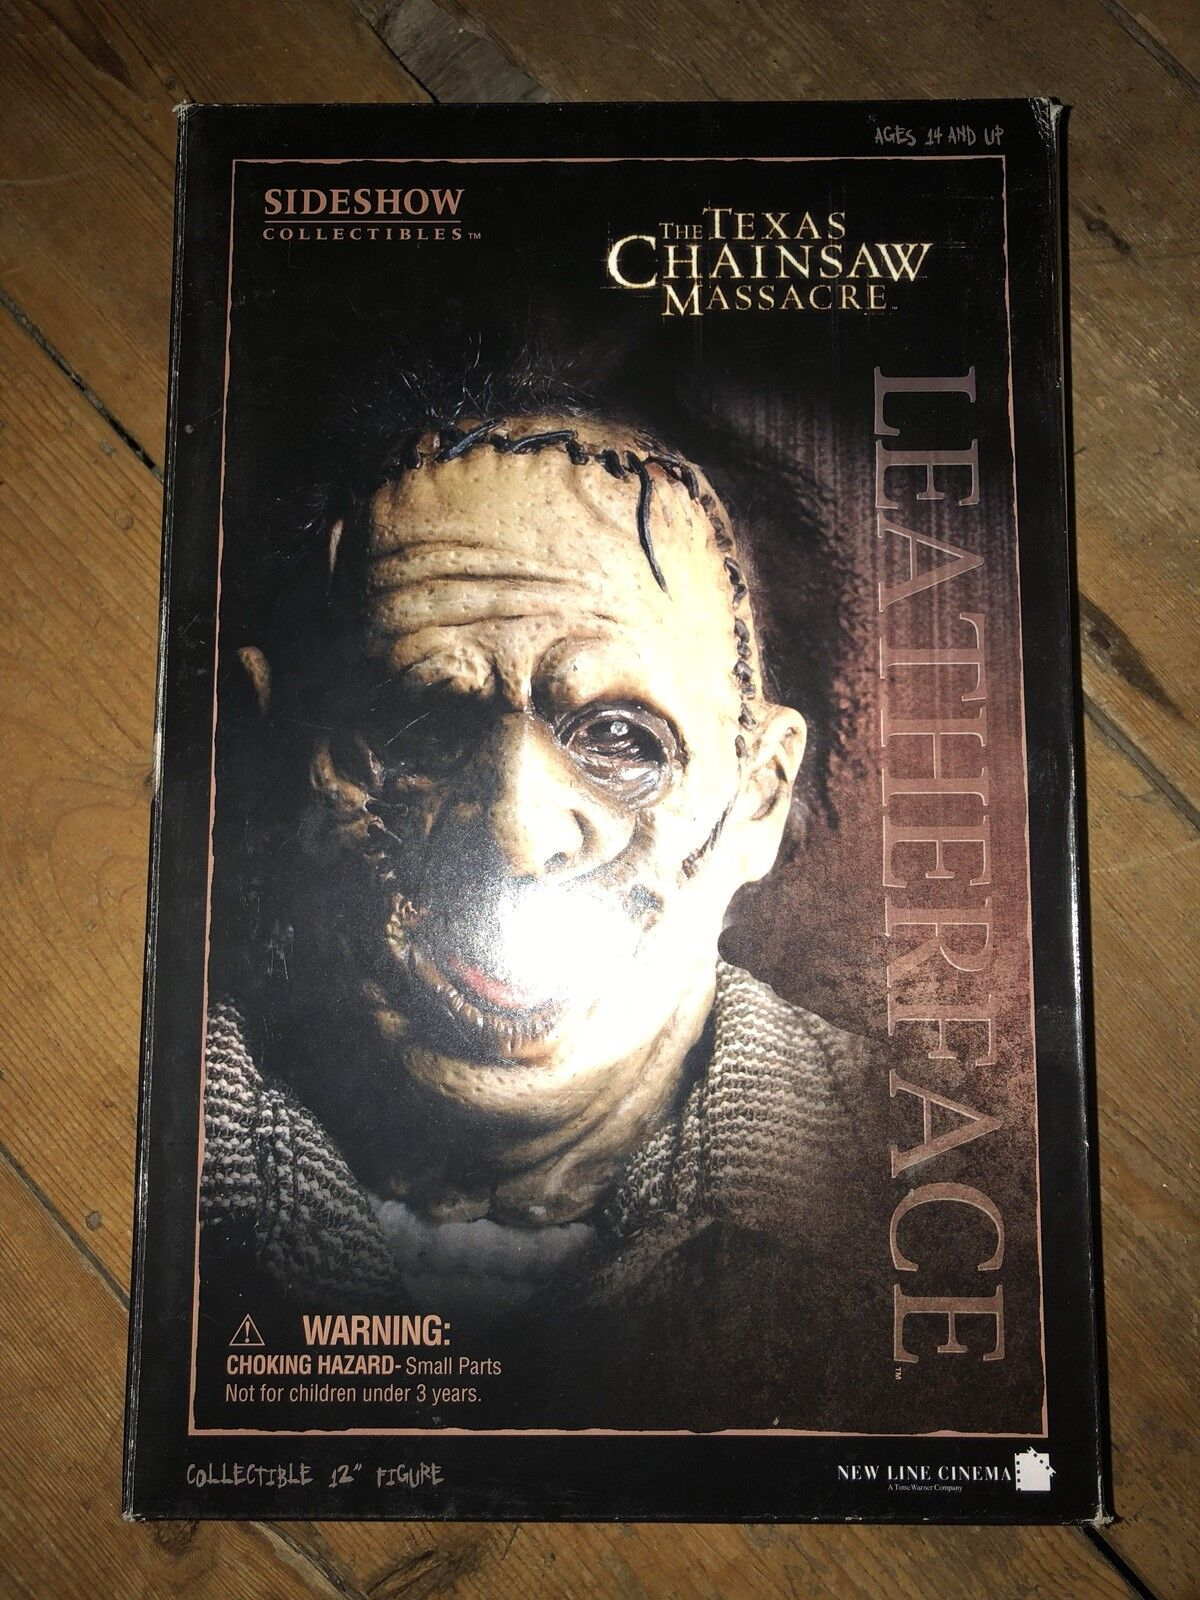 Sideshow Texas Chainsaw Massacre cuoio Thomas Hewitt afssc 127